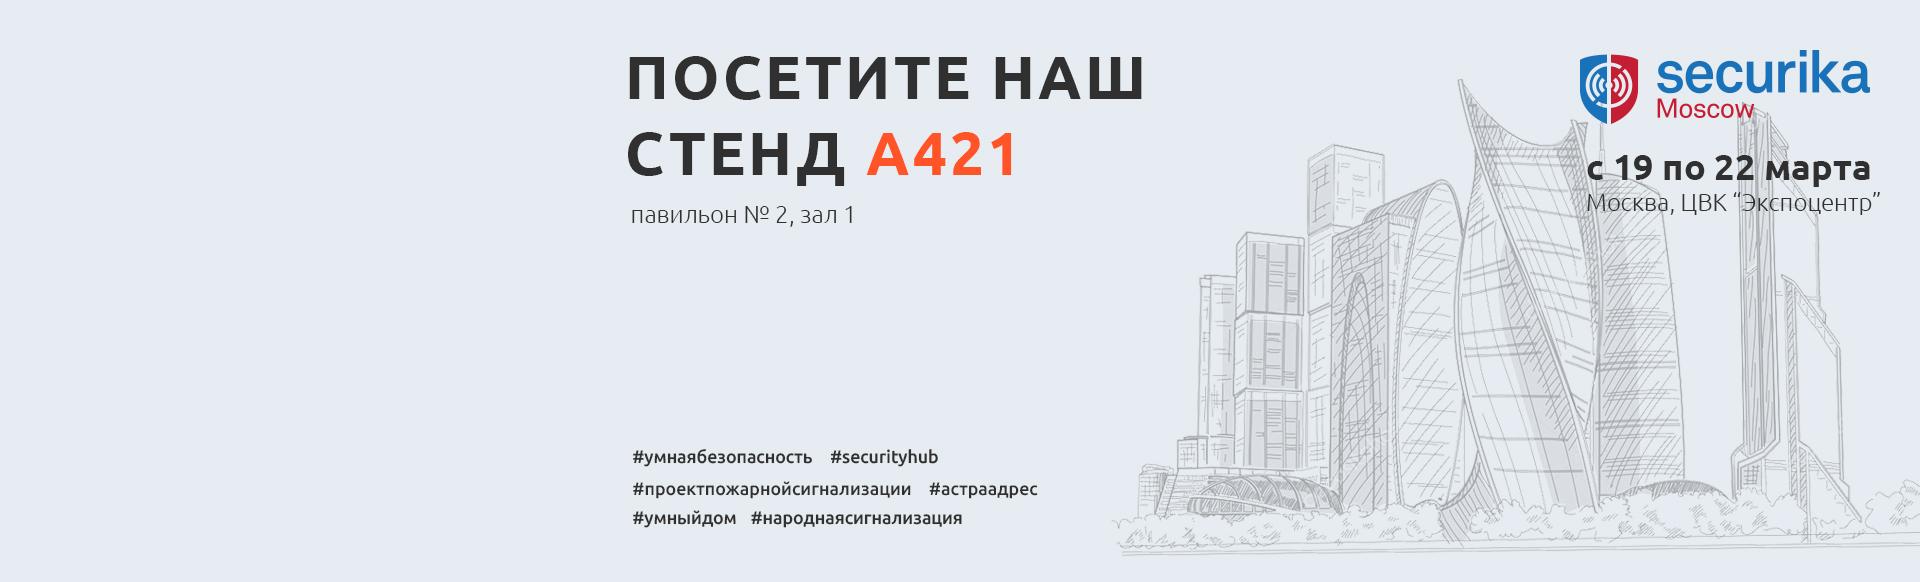 Securika Moscow 2019